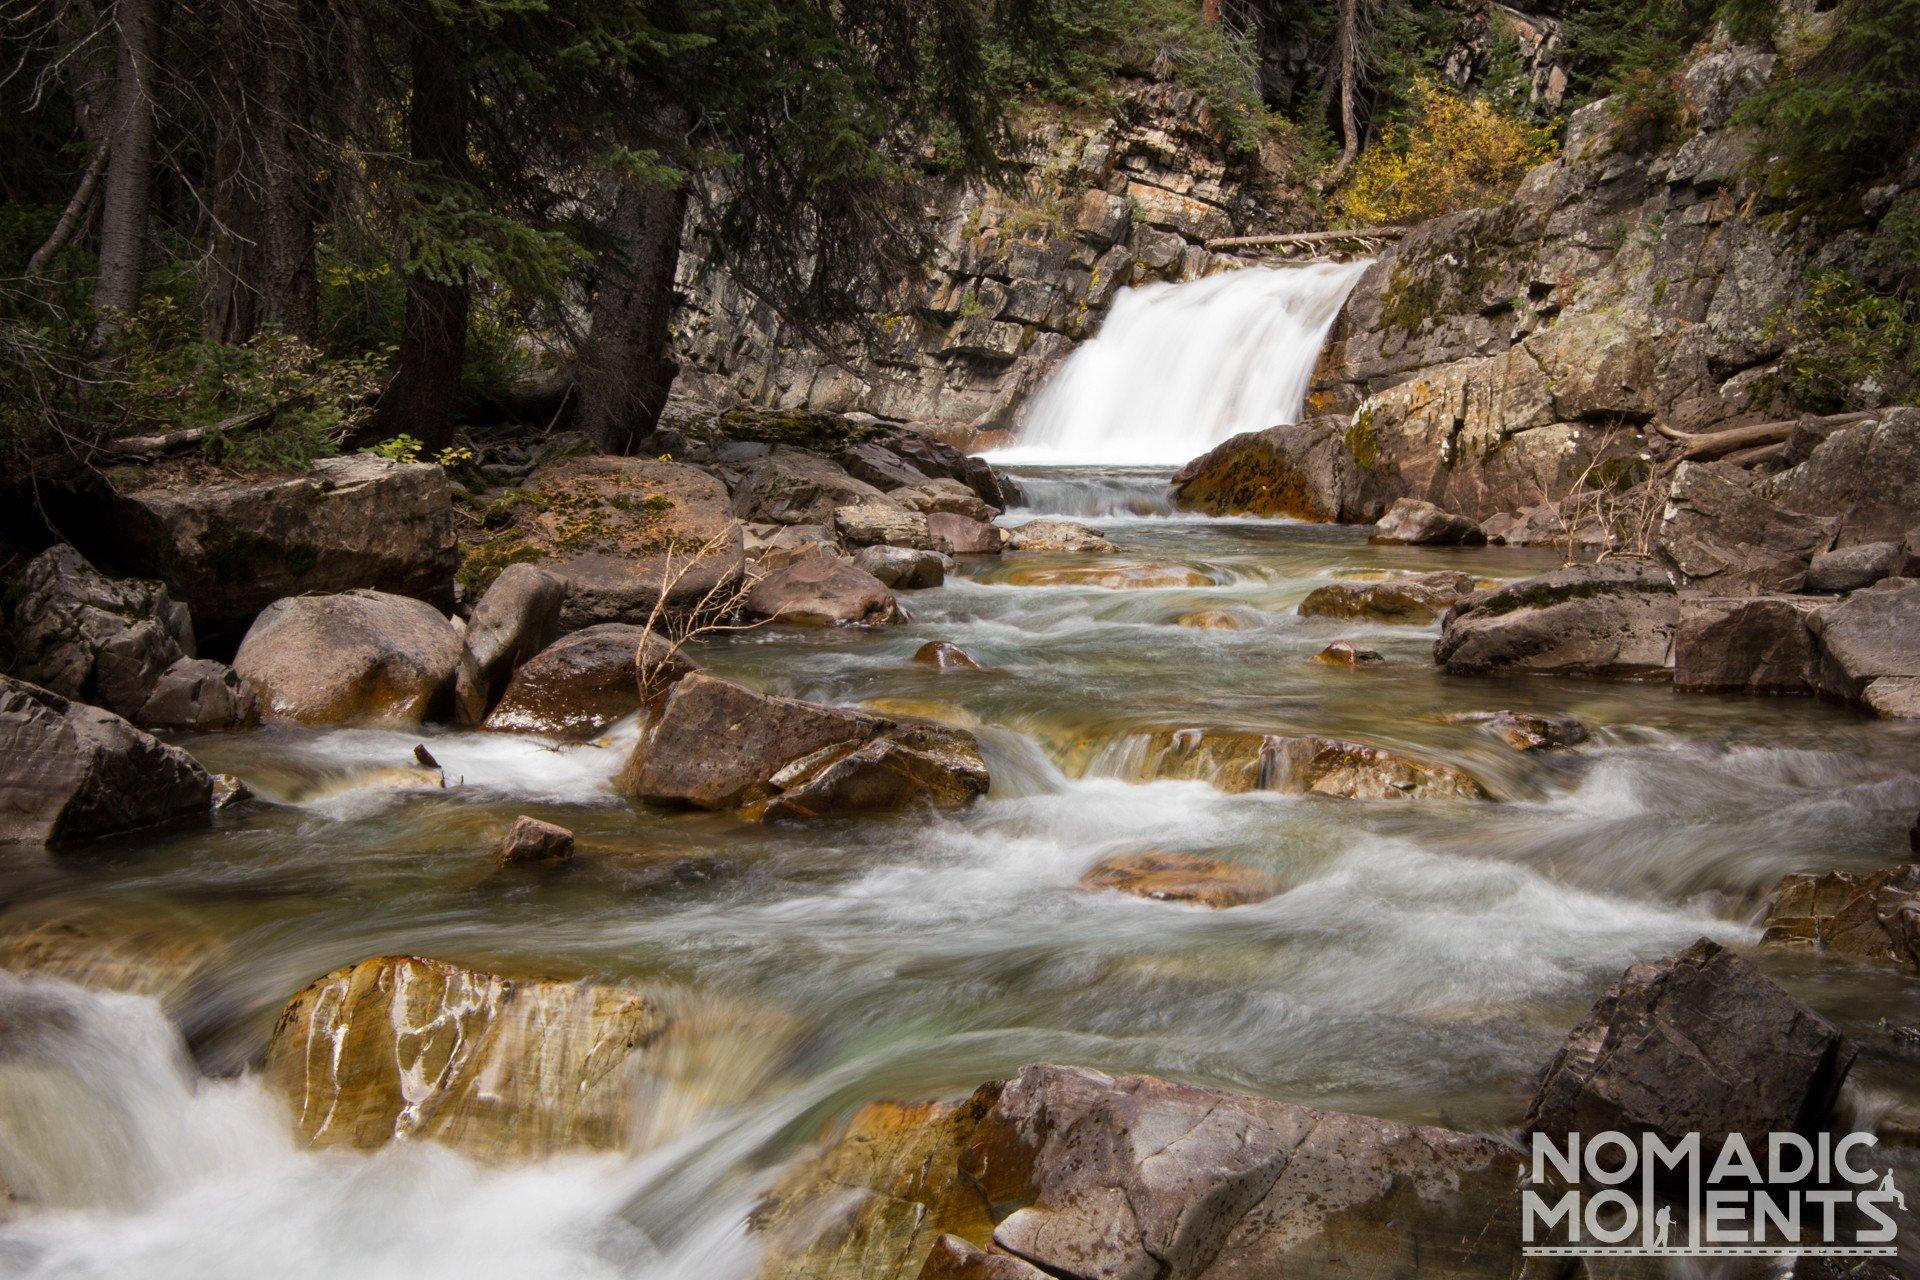 Crystal River in Lead King Basin